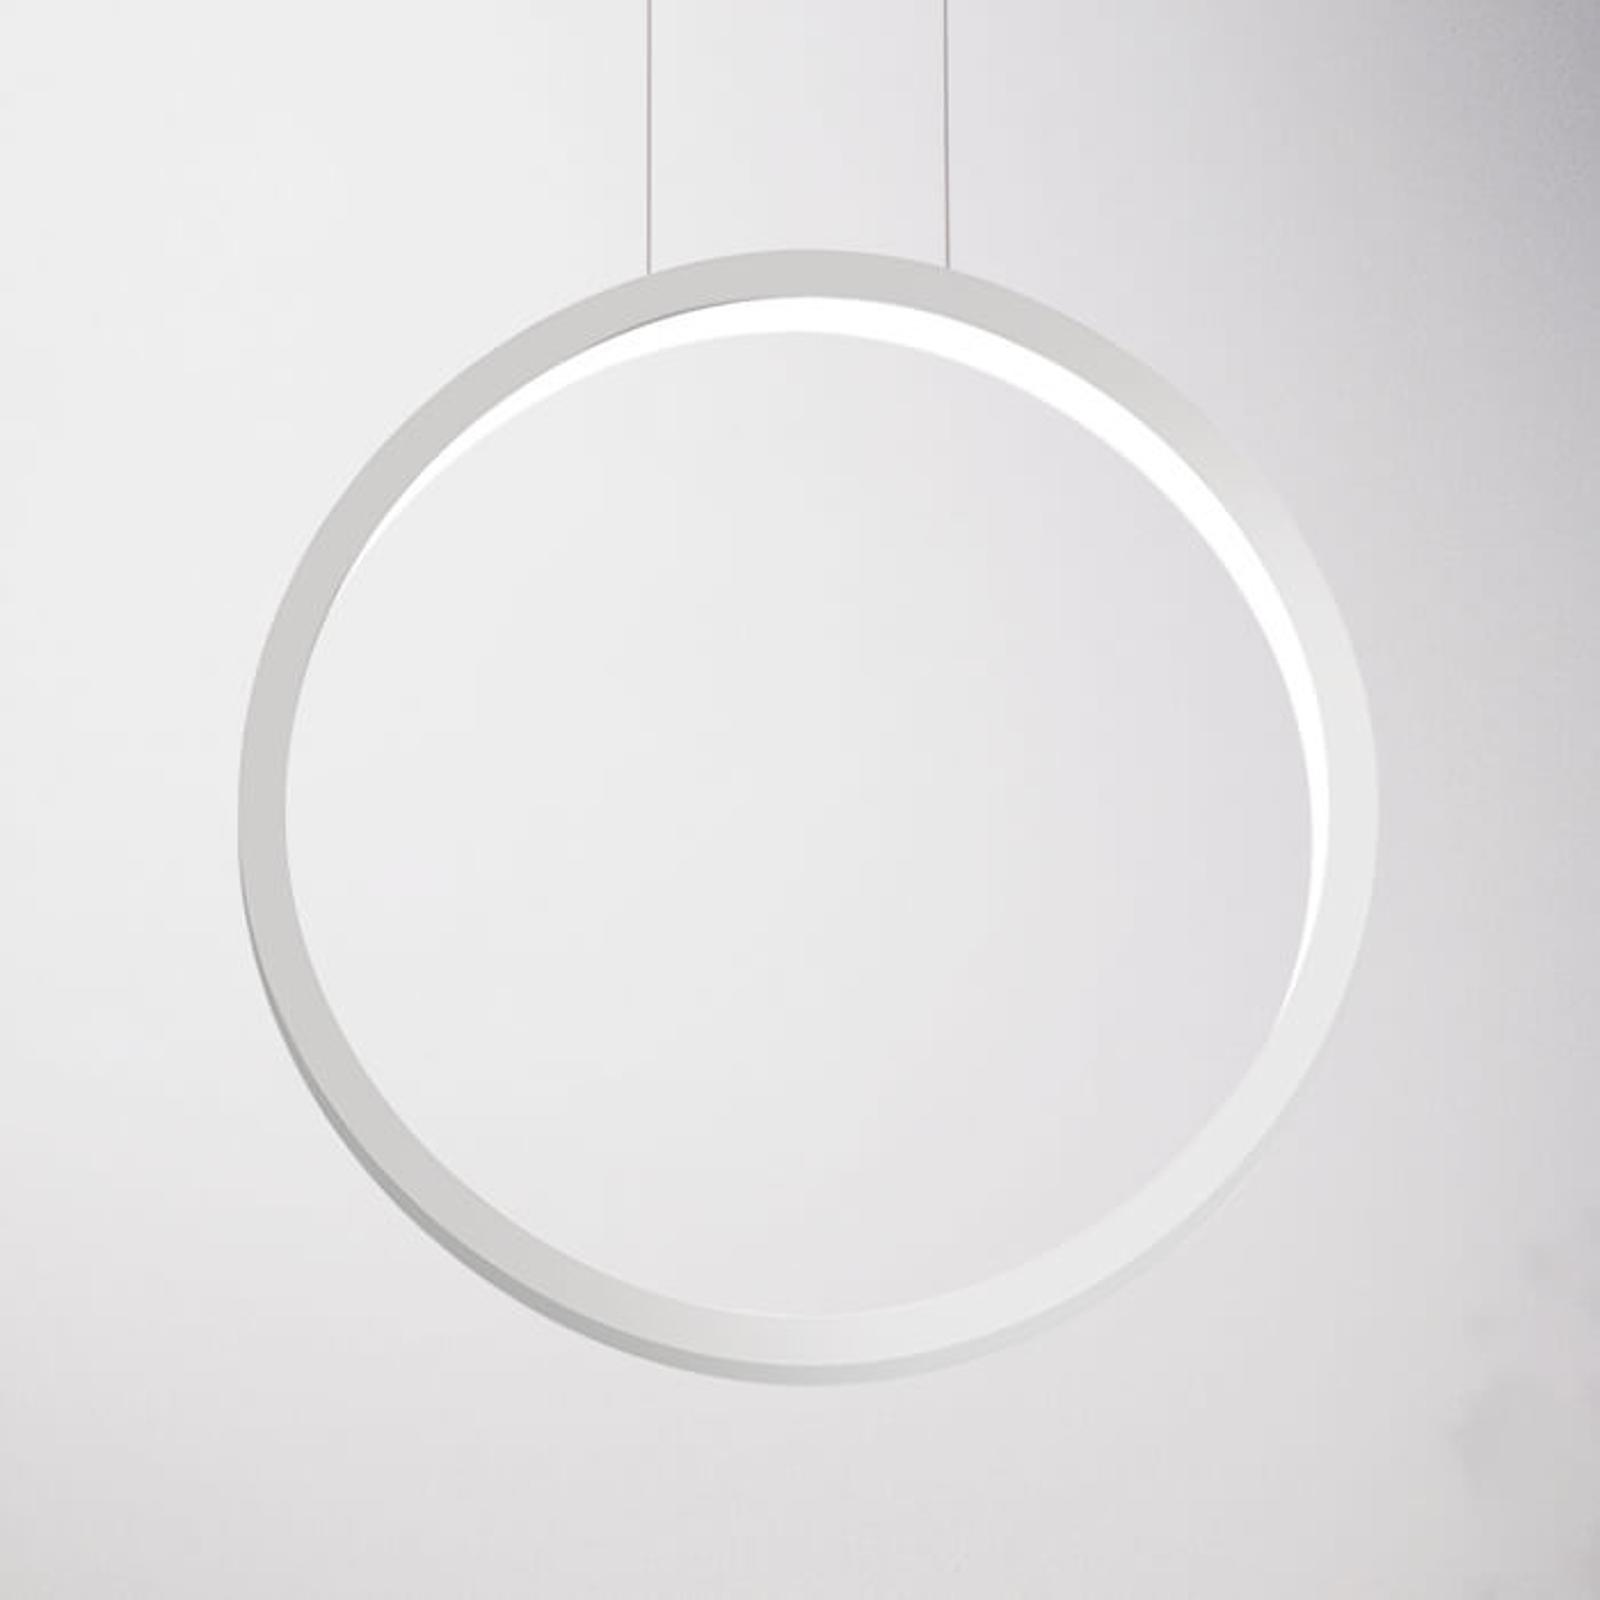 Designerska lampa wisząca LED Assolo, 43 cm